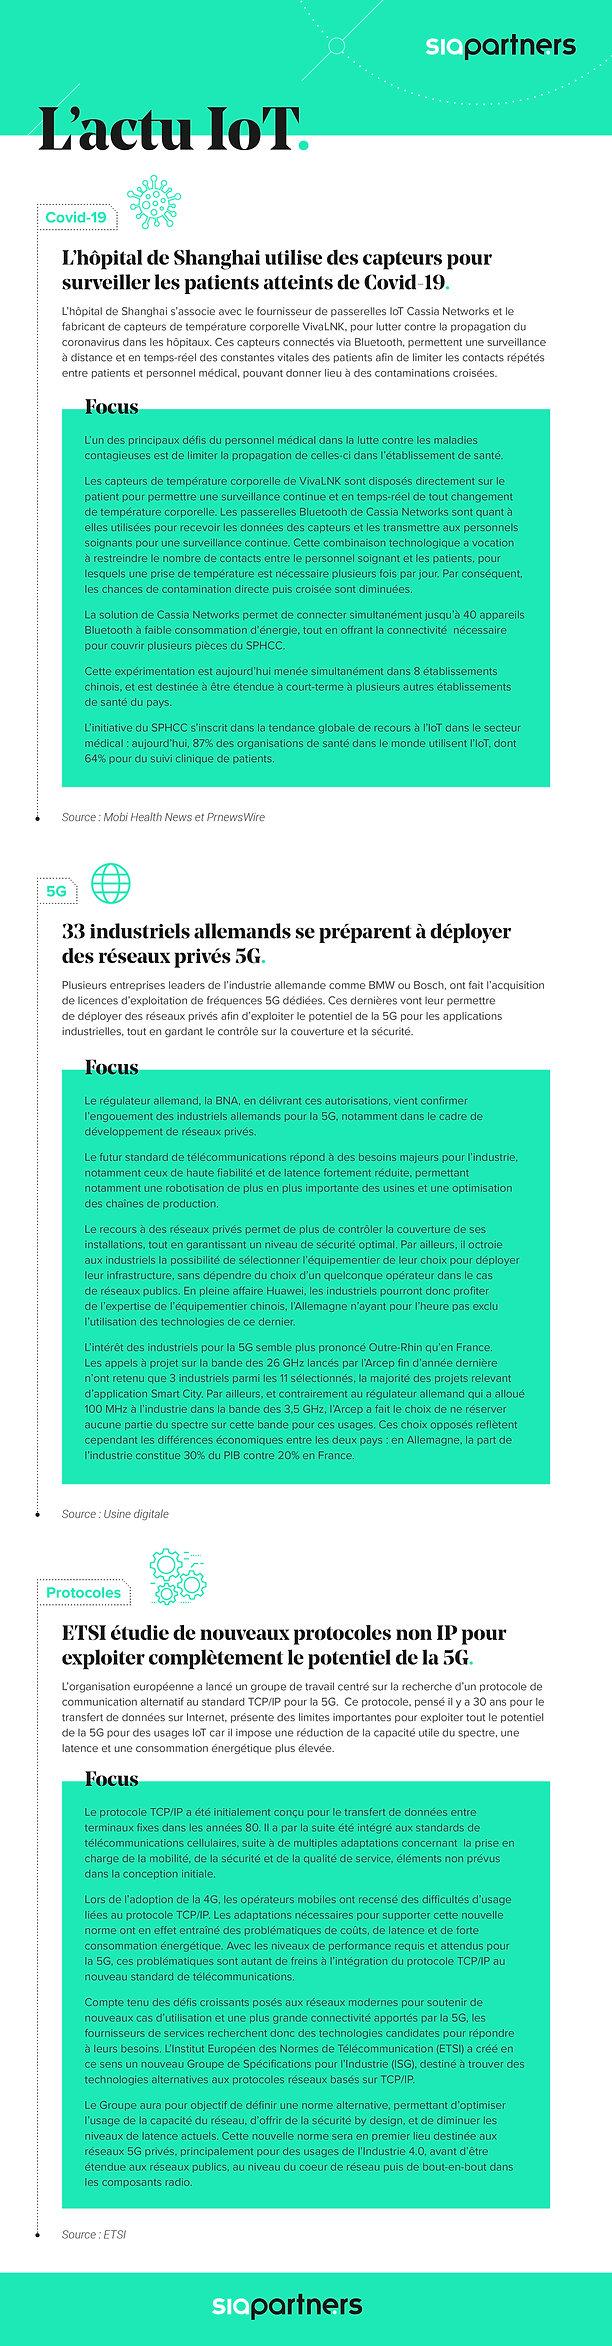 New_IoT - Avril 2020-longue.jpg